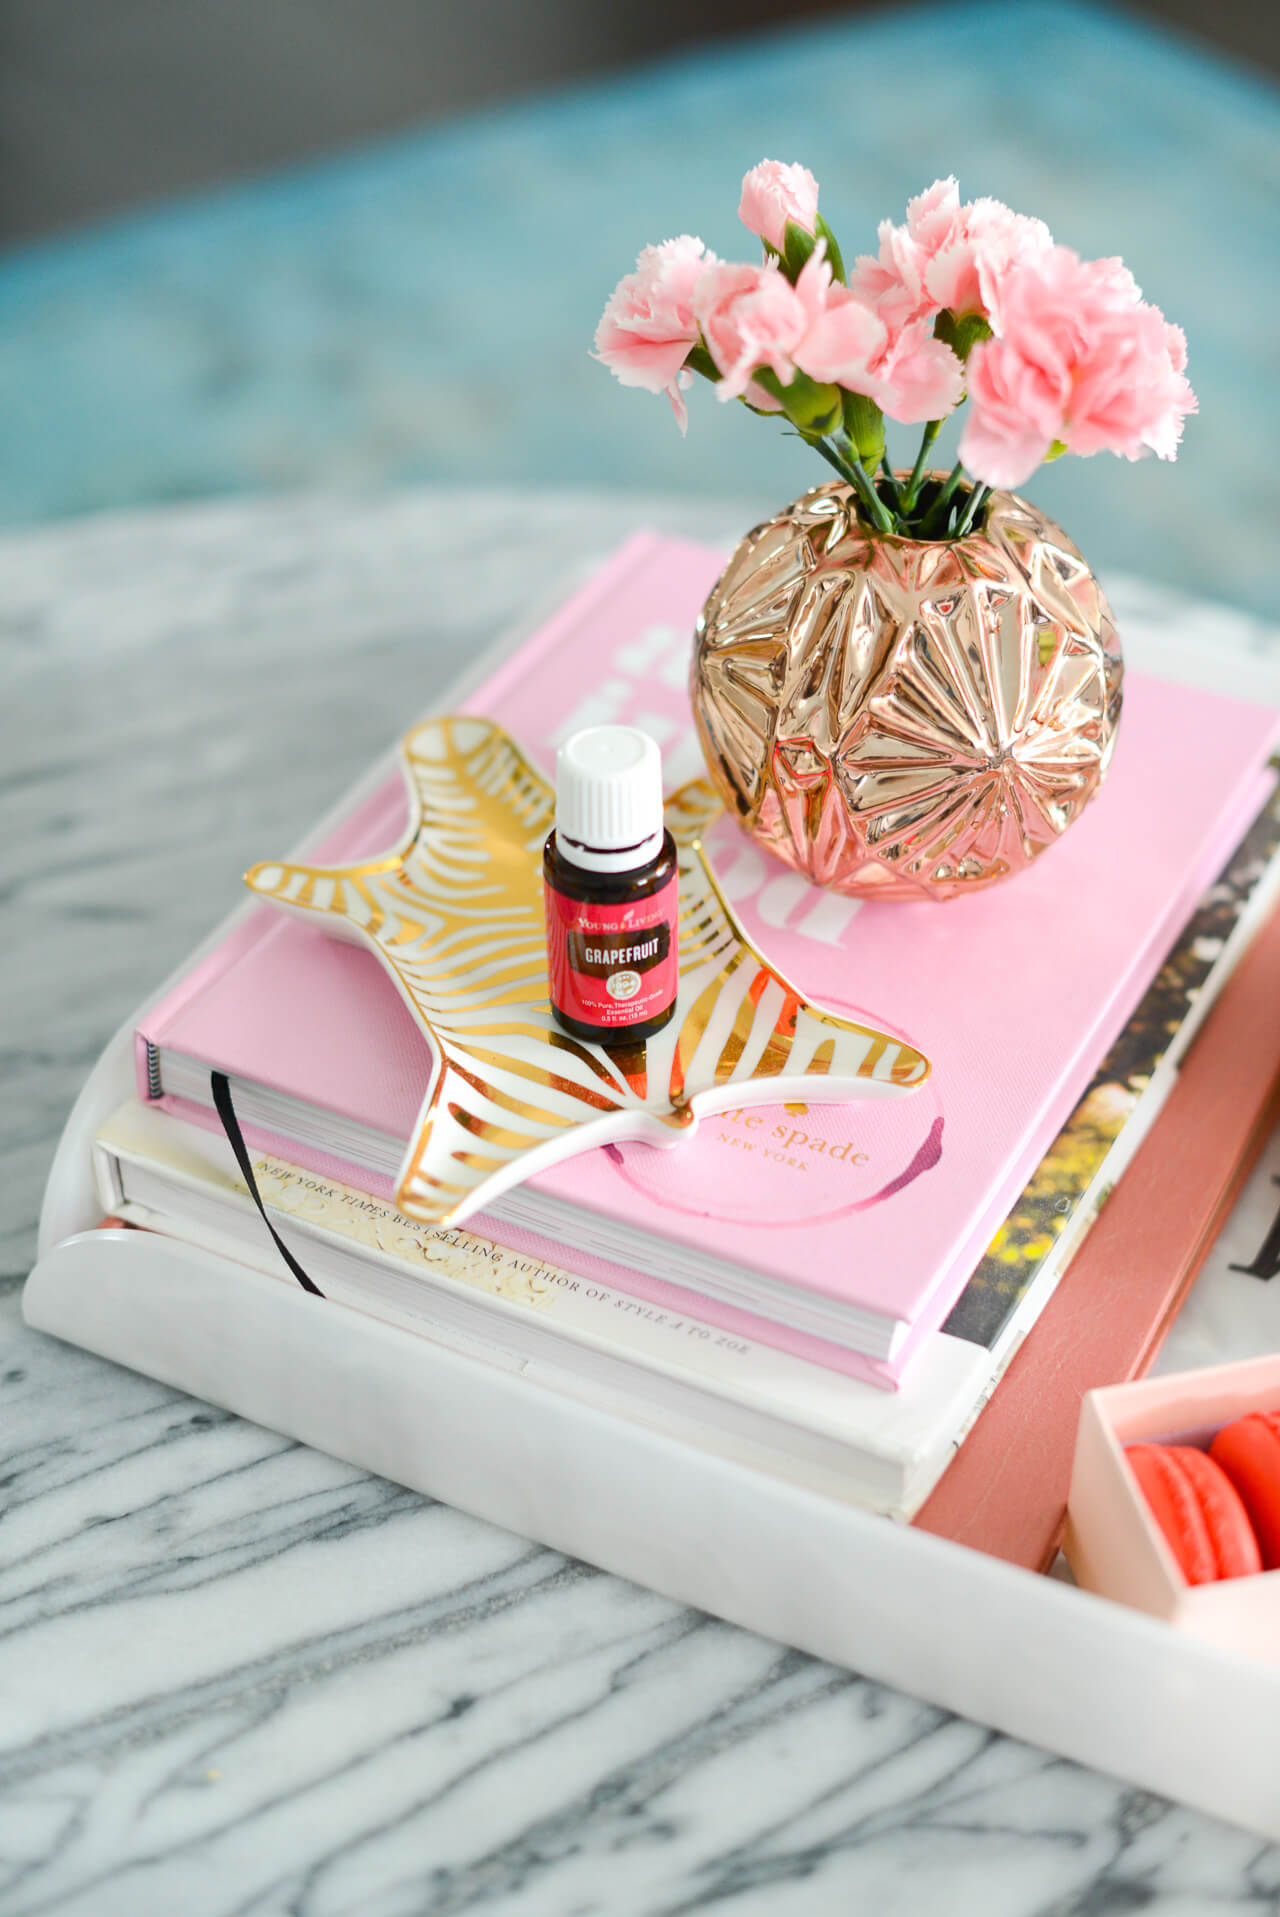 one of my favorite essential oils- grapefruit